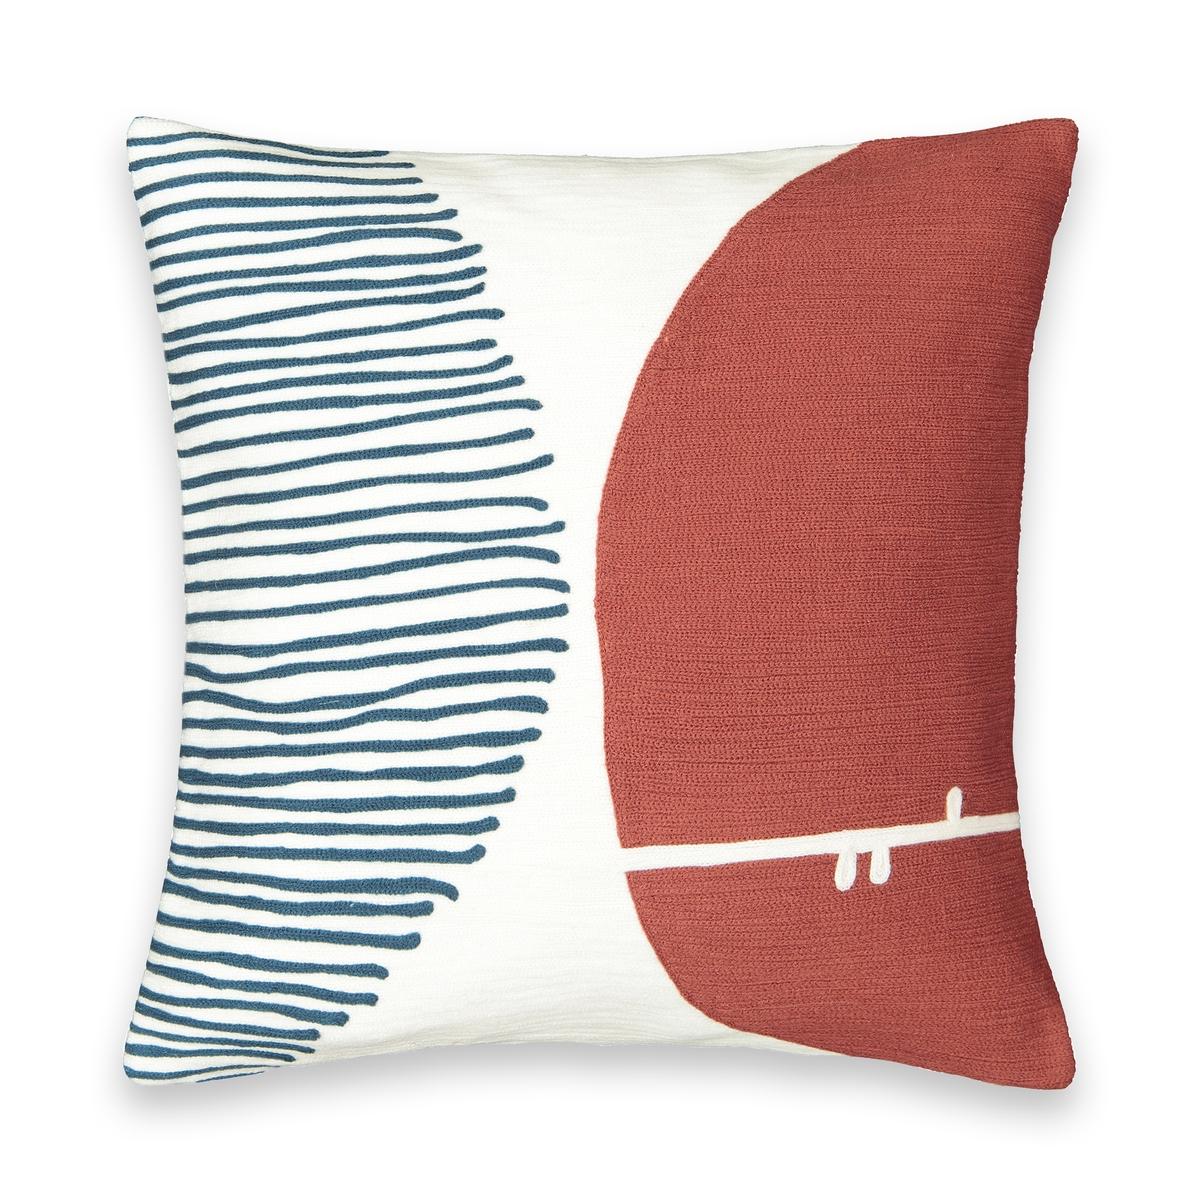 Чехол La Redoute На подушку с вышивкой Mihna 45 x 45 см синий чехол la redoute для подушки eppaloc 45 x 45 см оранжевый